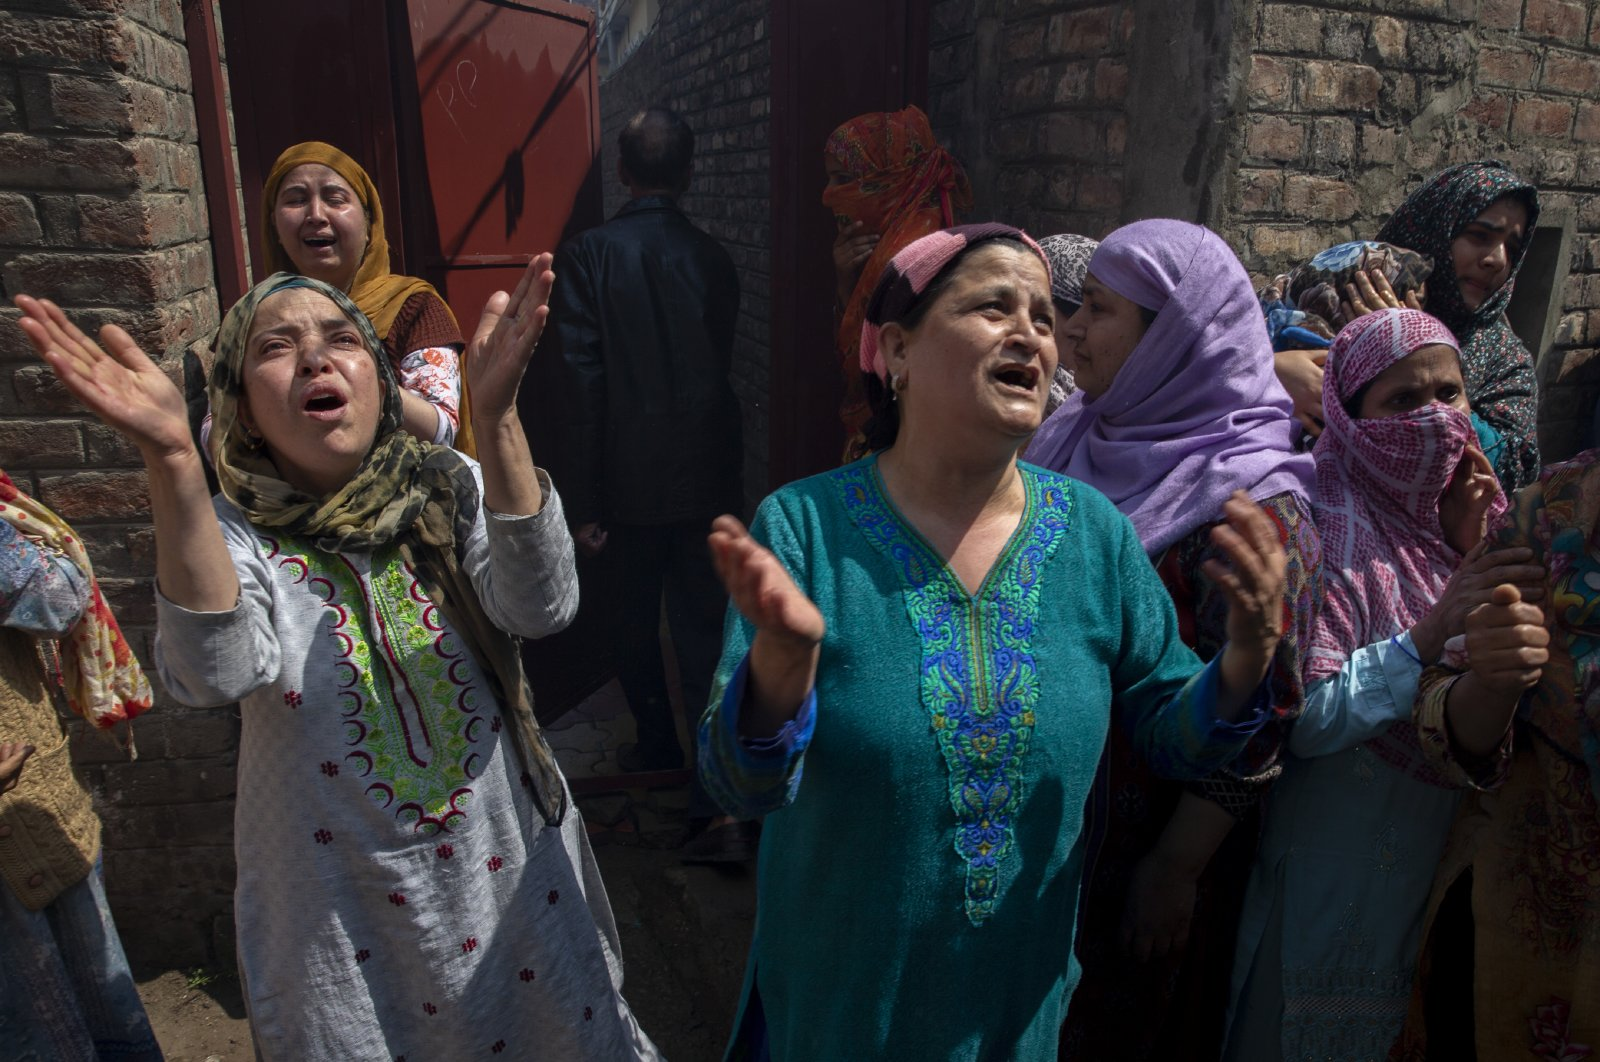 Kashmiri women grieve near the residential buildings damaged during a gun battle in Srinagar, Indian controlled Kashmir, May 19, 2020. (AP)